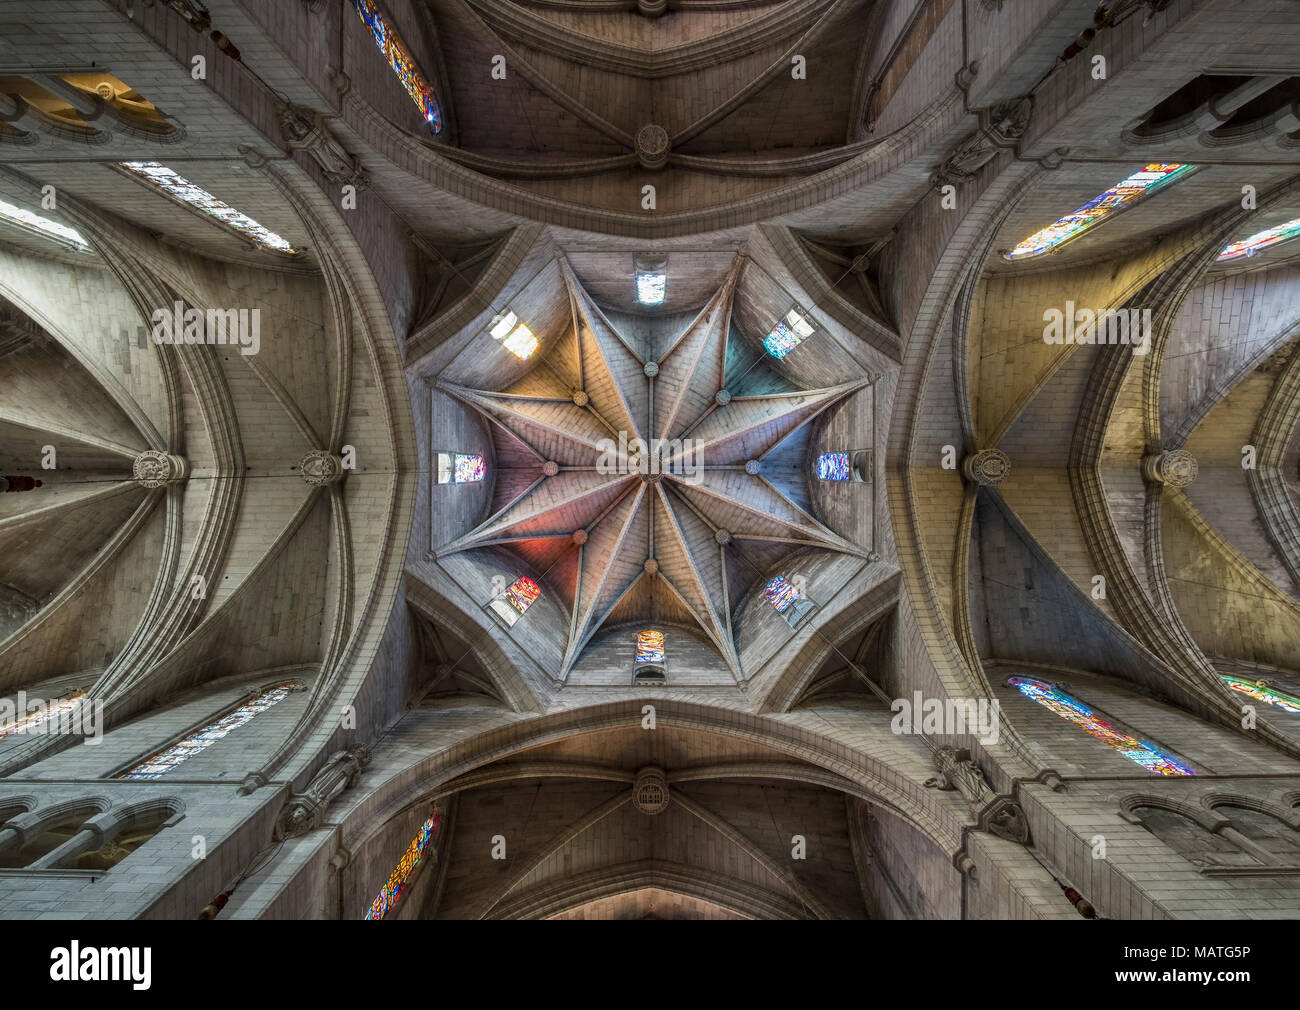 Mallorca, Esglesia Nostra Senyora dels Dolors, Blick in die Gewölbe des Vierungsturms - Stock Image